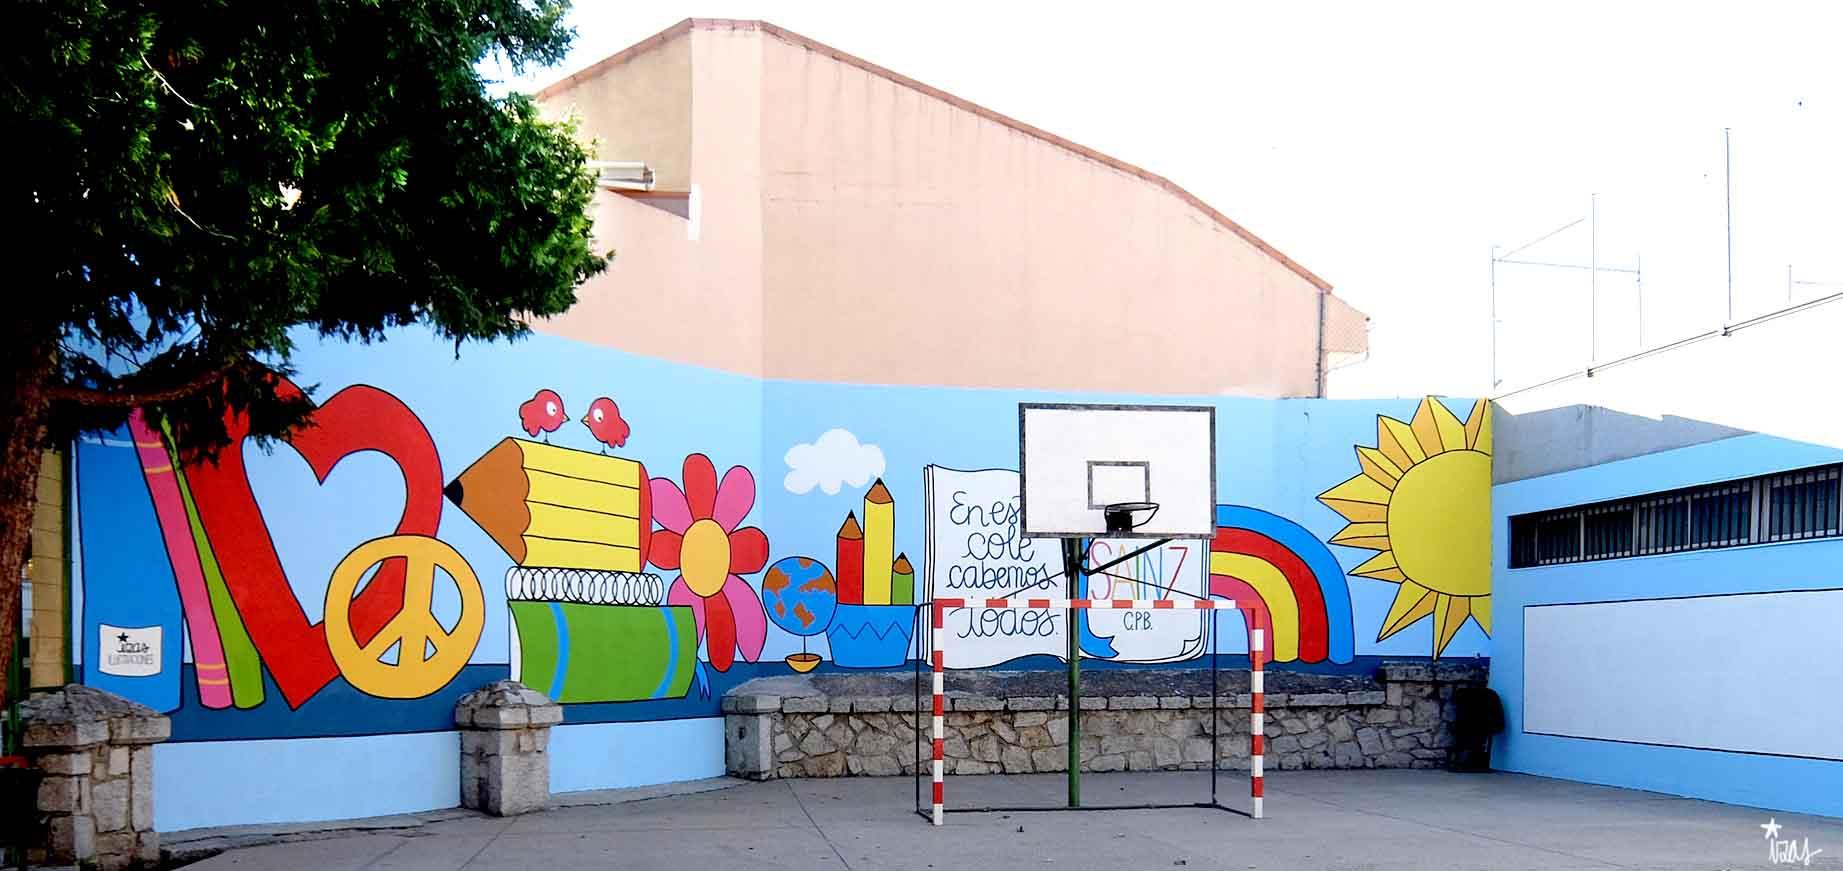 mural izas soledad sainz exterior 1